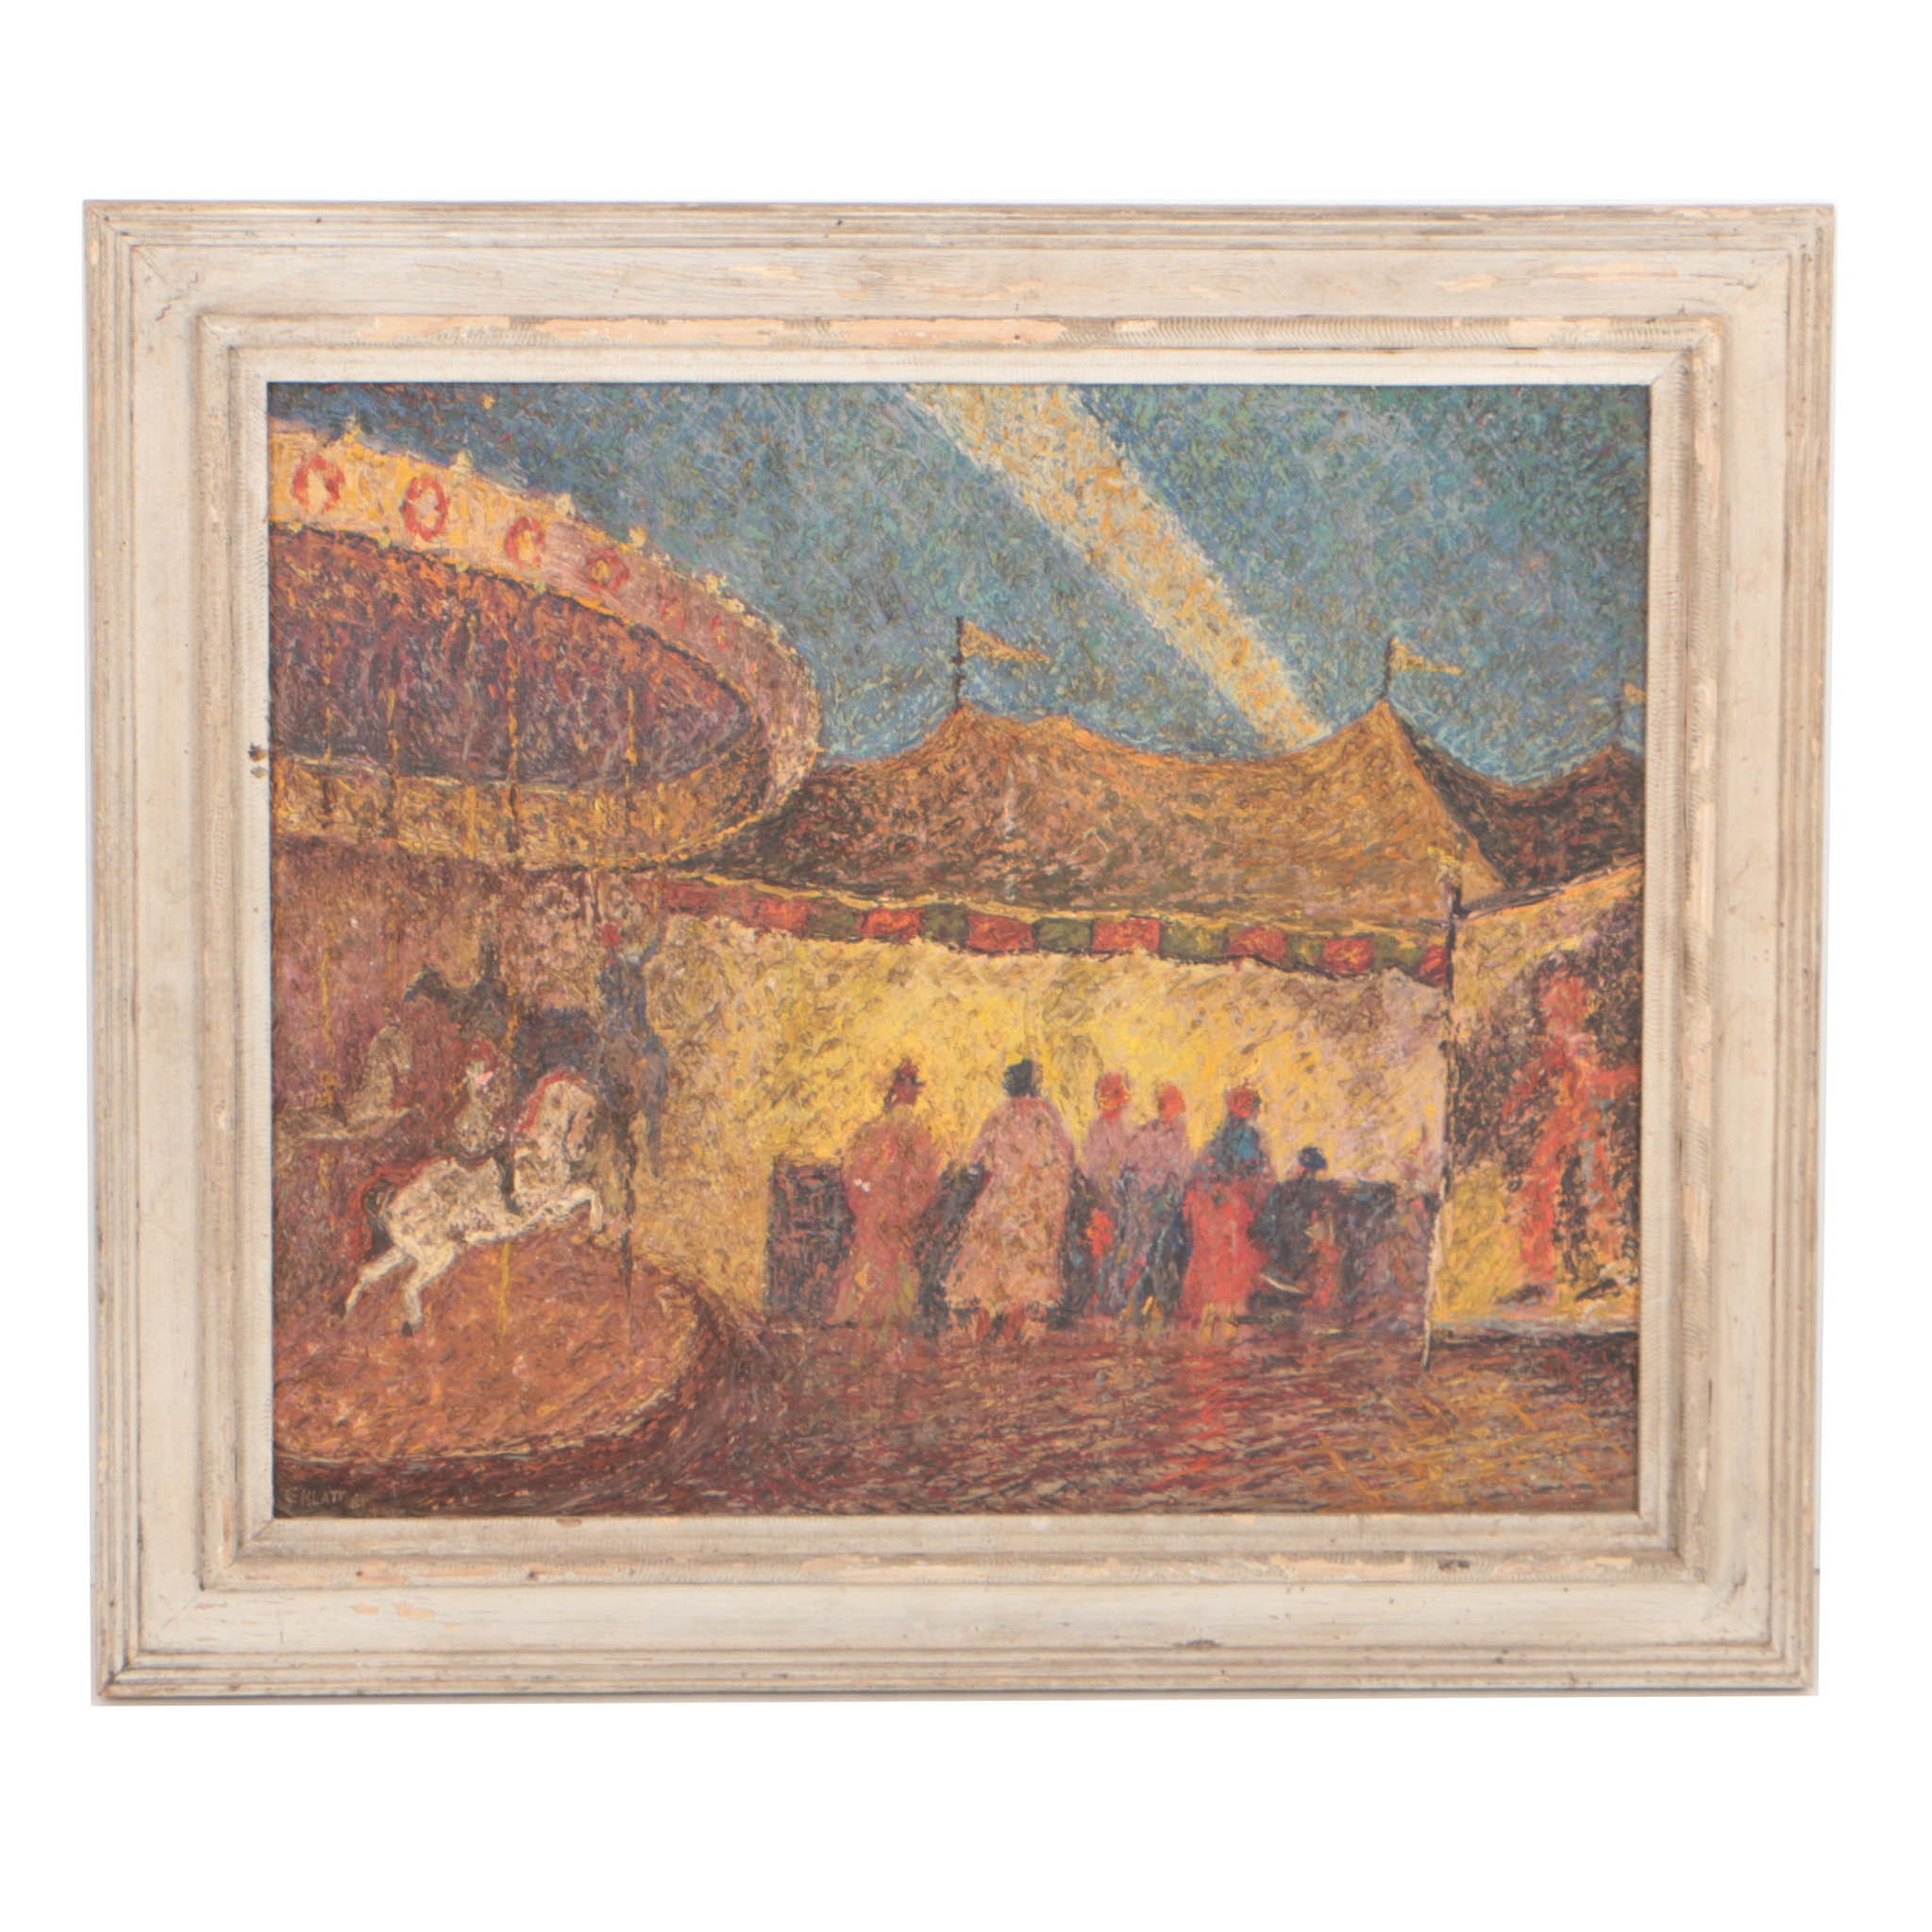 "Clarence Klatt 1961 Oil Painting ""County Fair"""